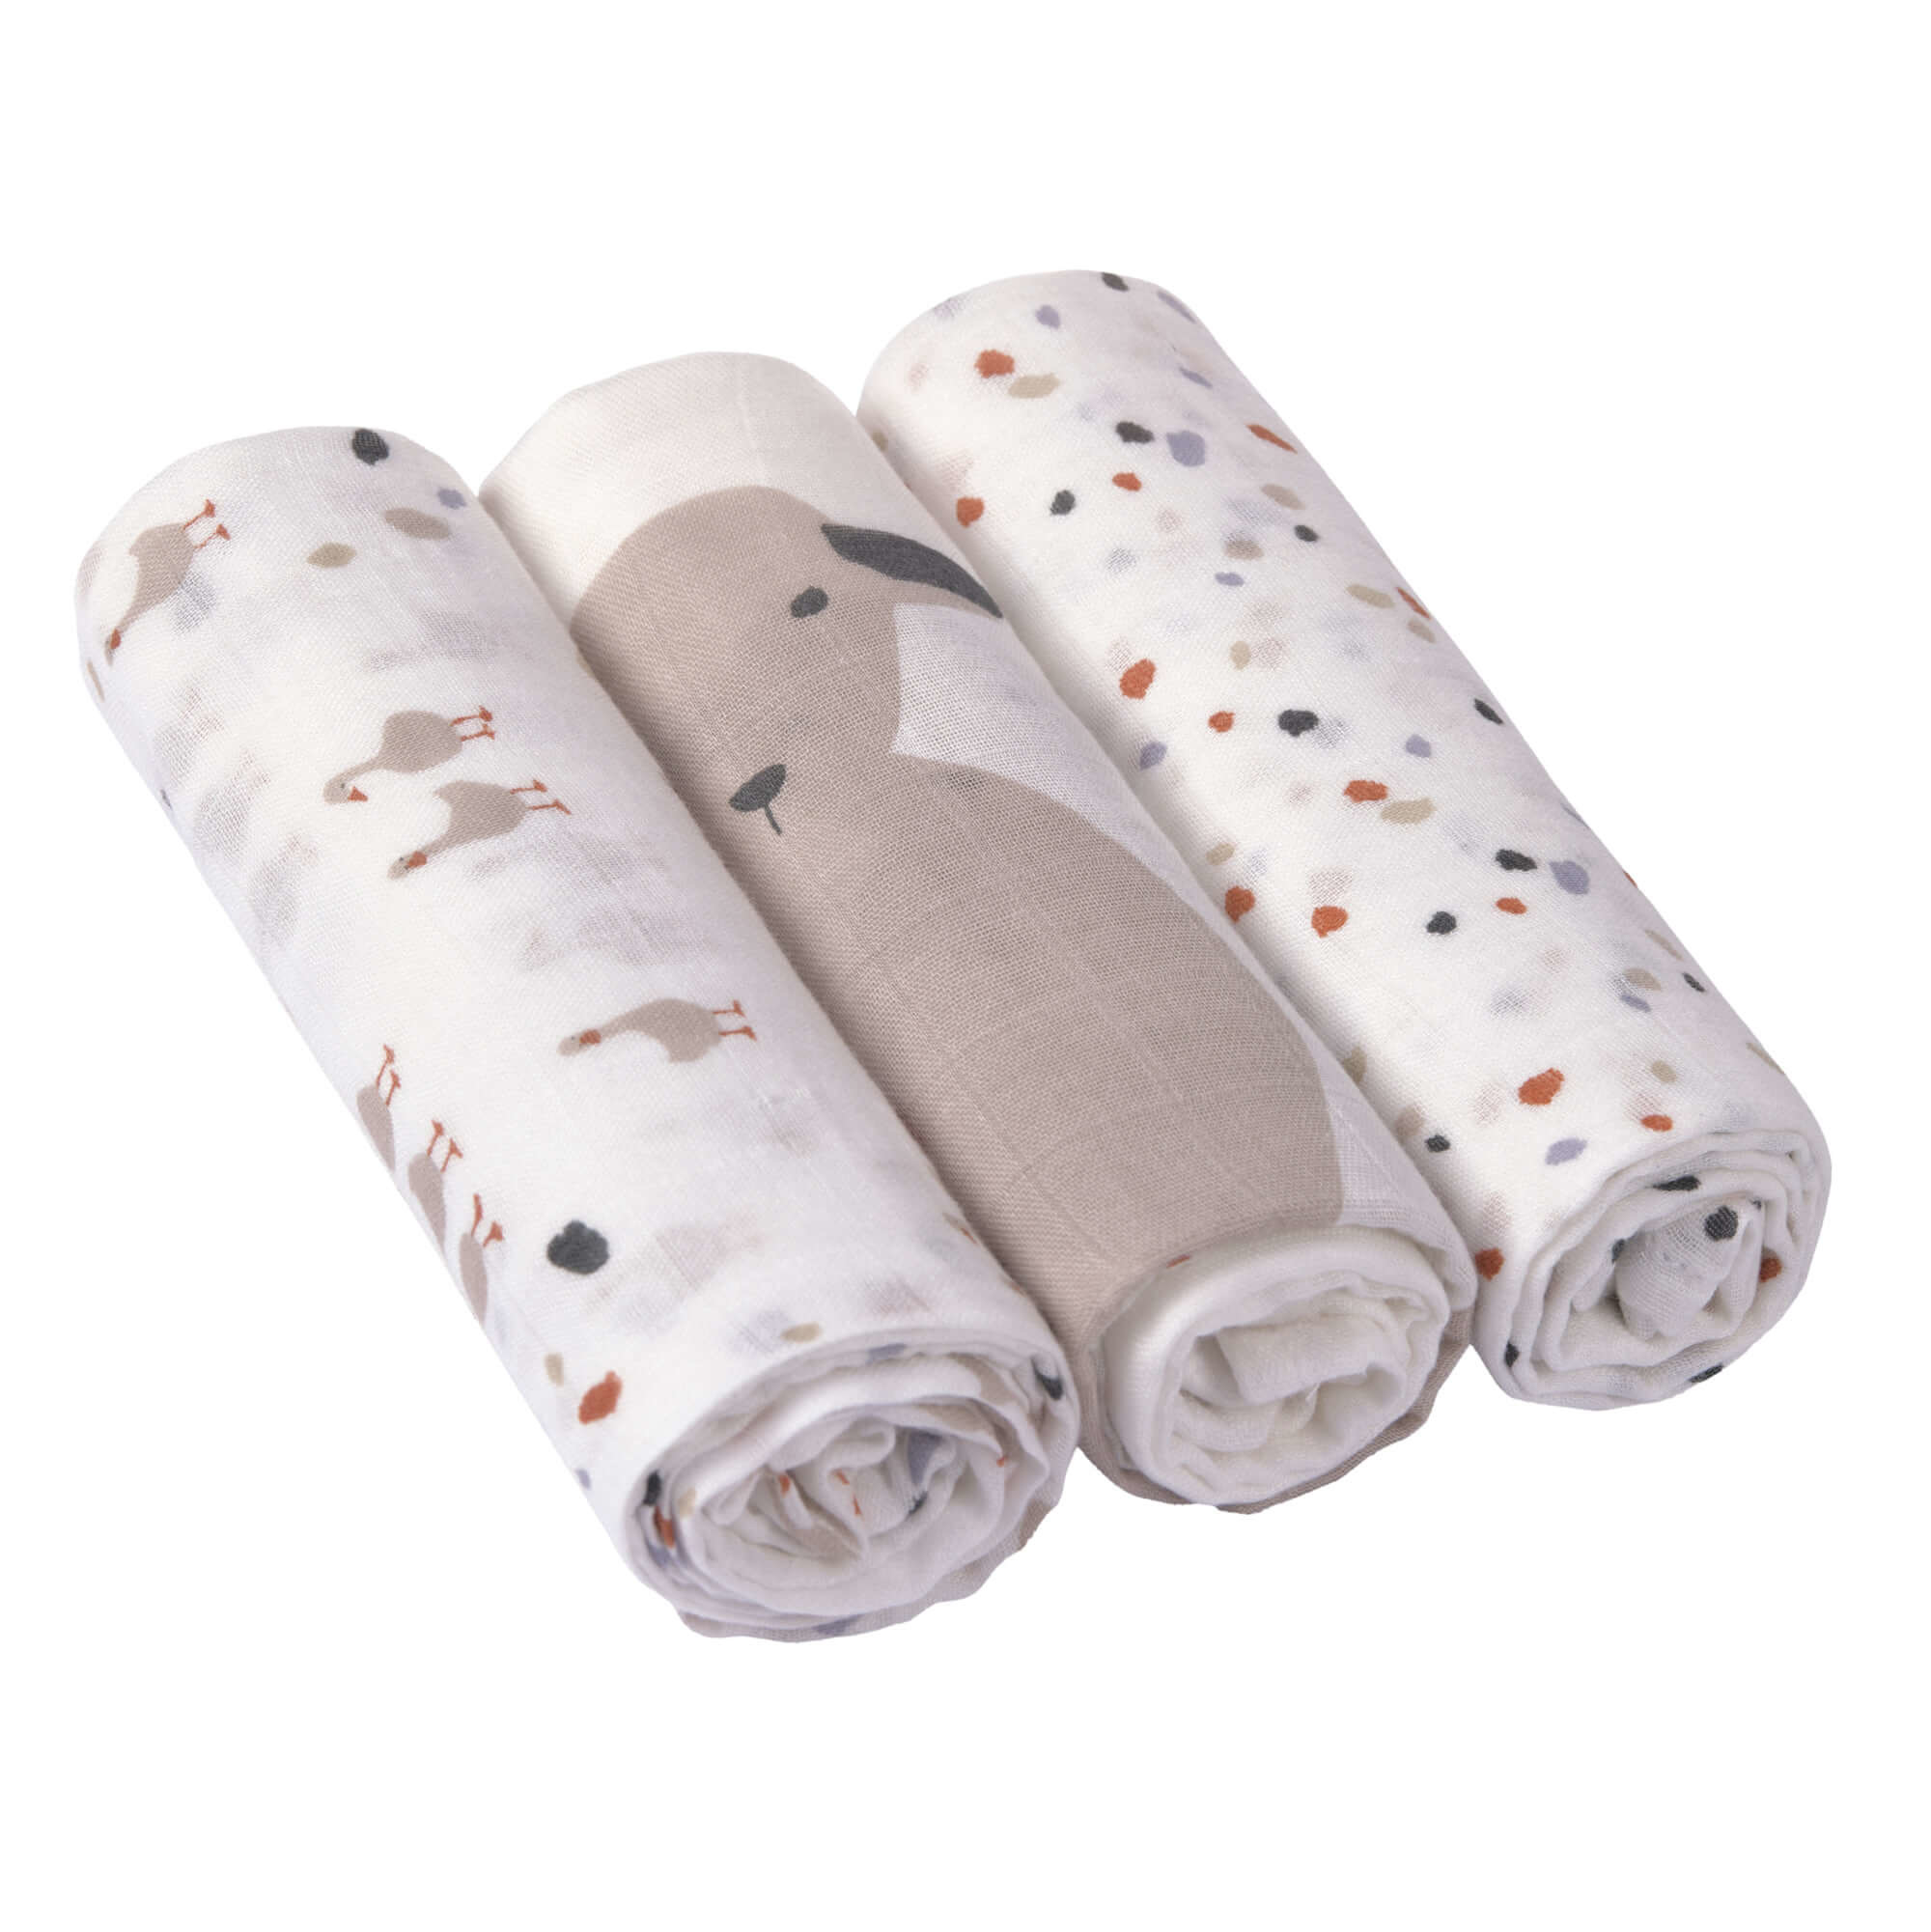 Lässig Heavenly soft swaddle doek / luier L 3 stuks Tiny Farmer Speckles 80 x 80 cm